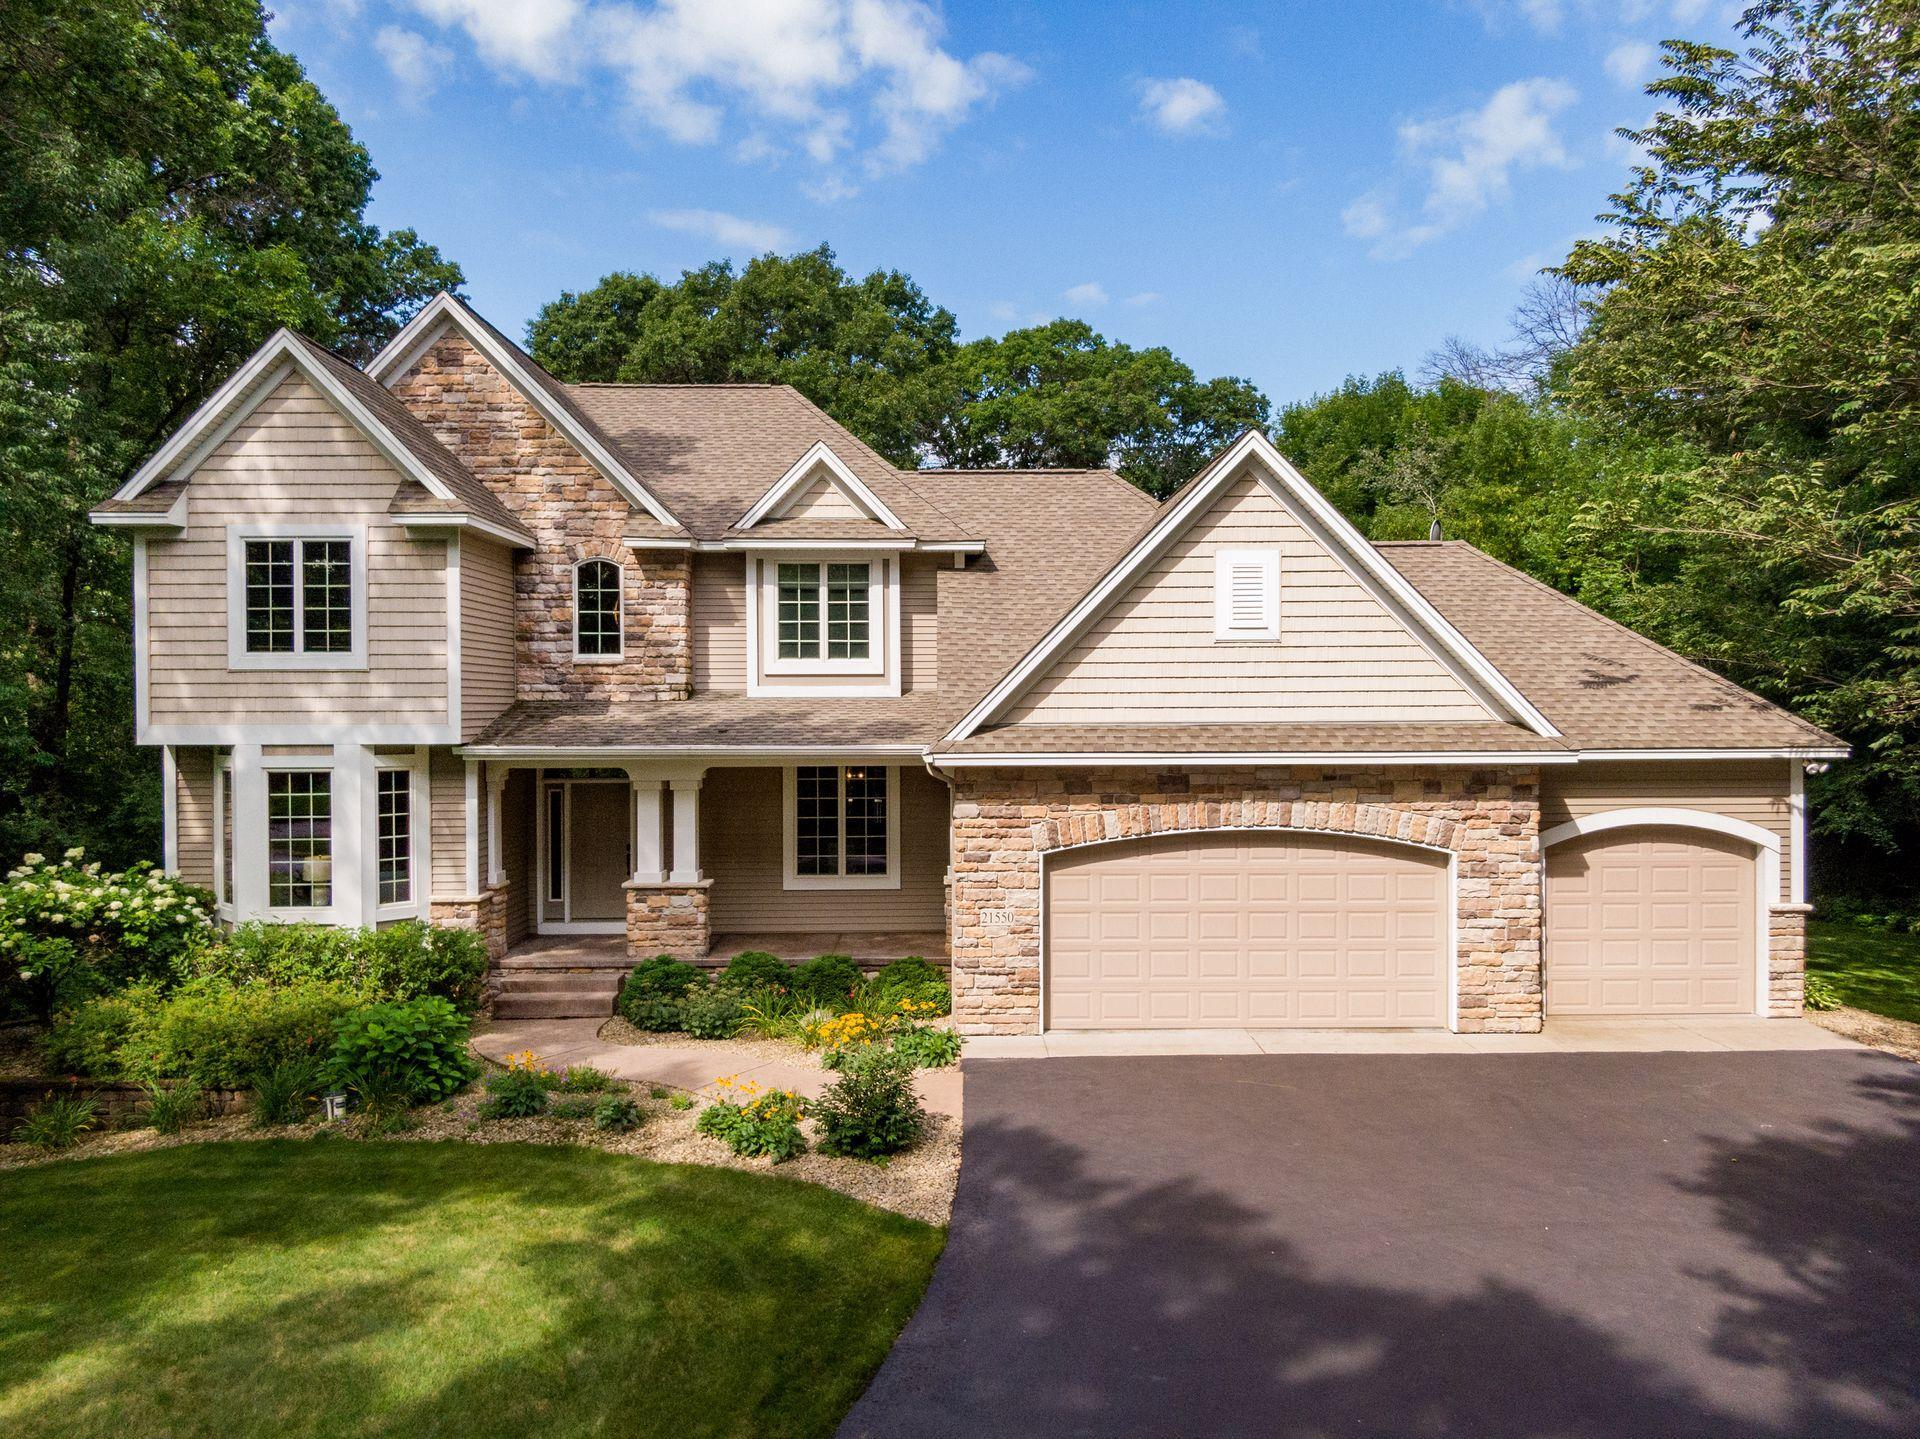 21550 183rd Street NW Property Photo - Big Lake, MN real estate listing